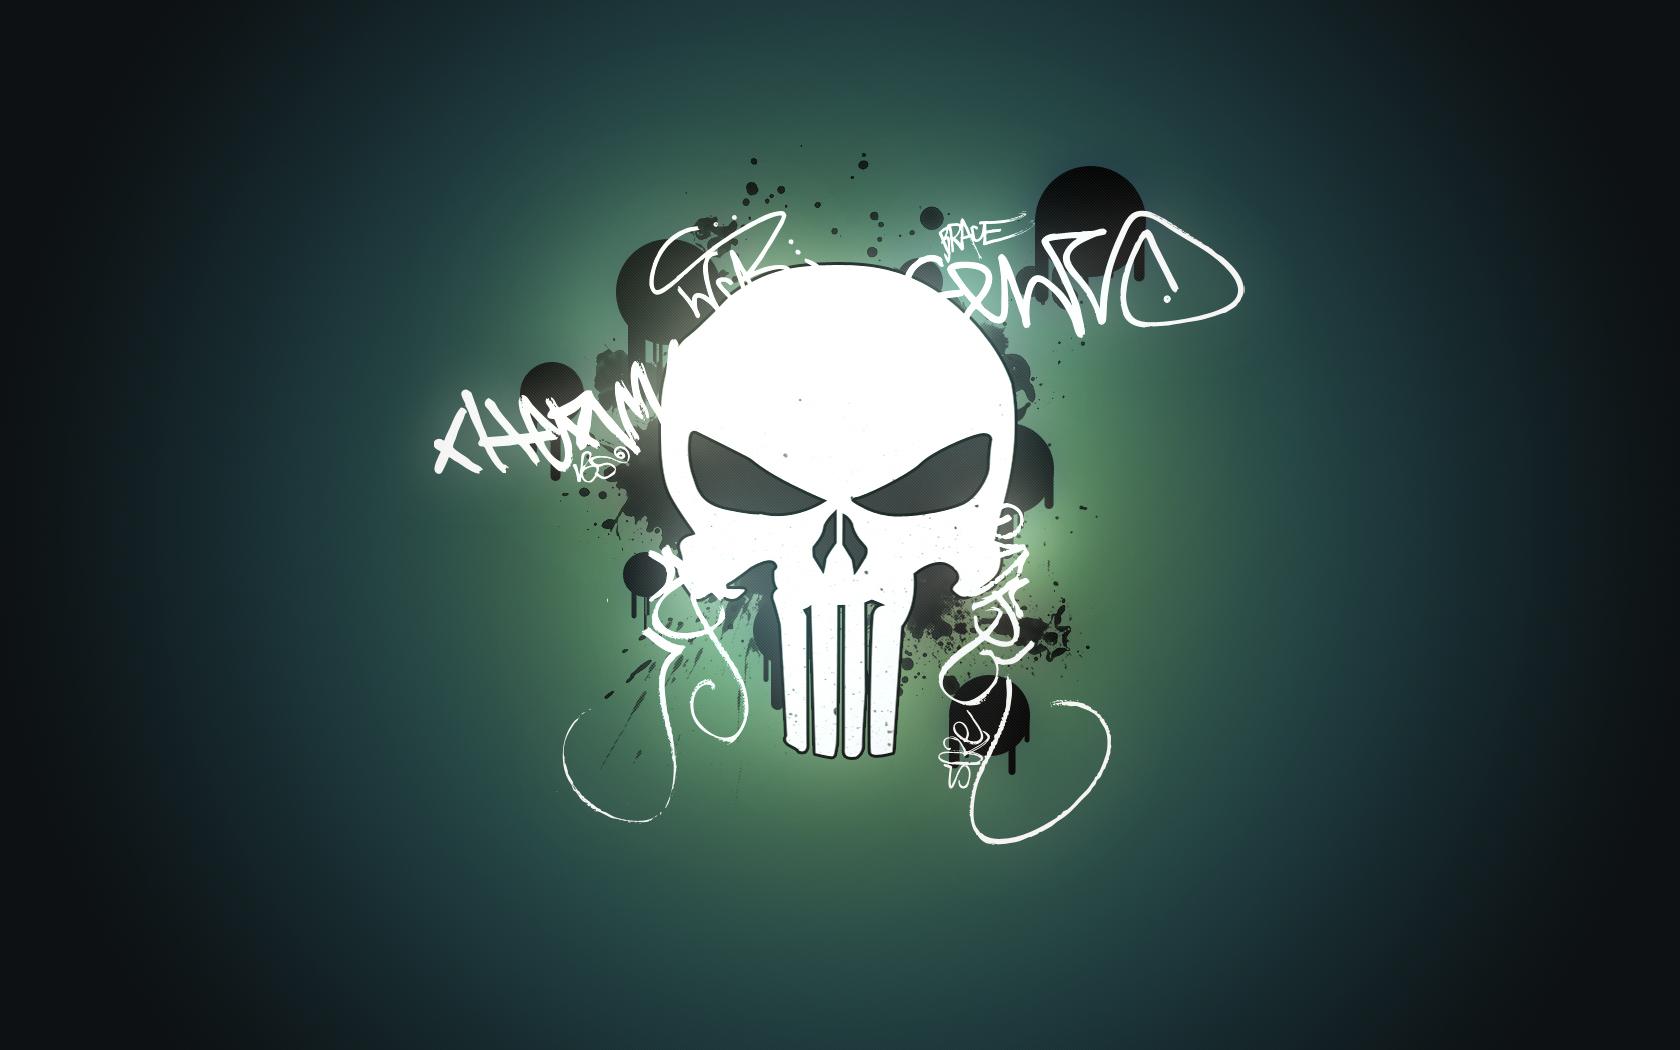 Images > The Punisher Logo Wallpaper